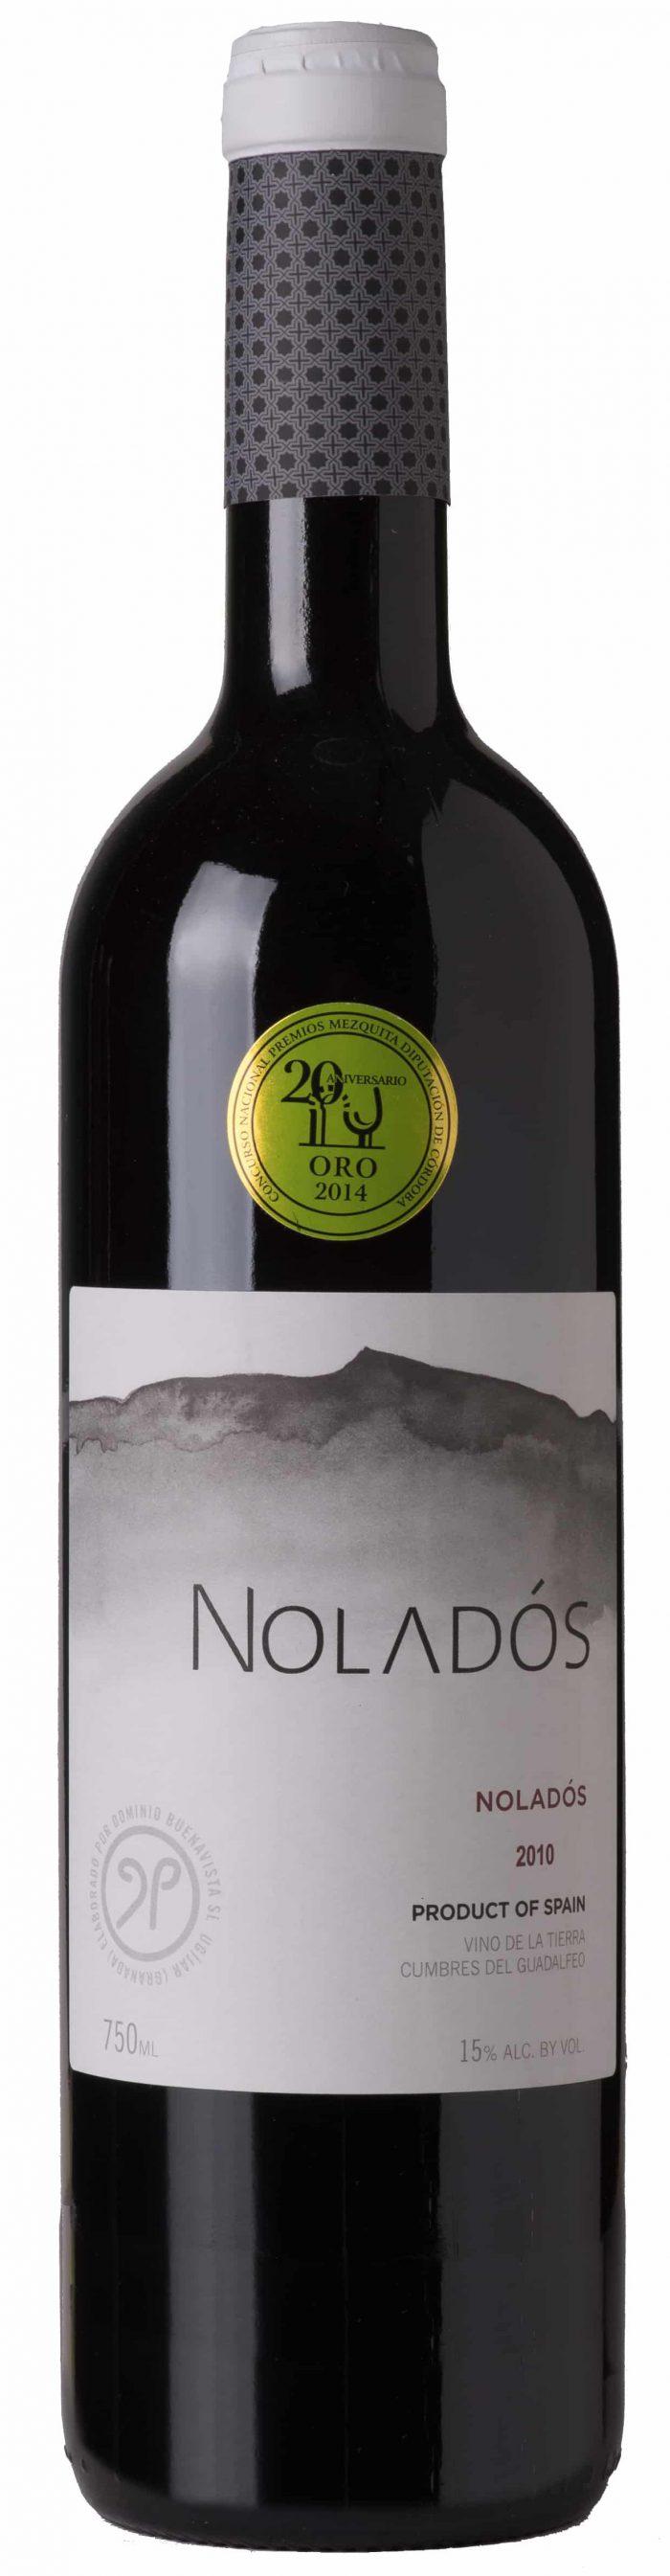 Veleta Noladós | Spanje | gemaakt van de druif: Cabernet Franc, Cabernet Sauvignon, Tempranillo